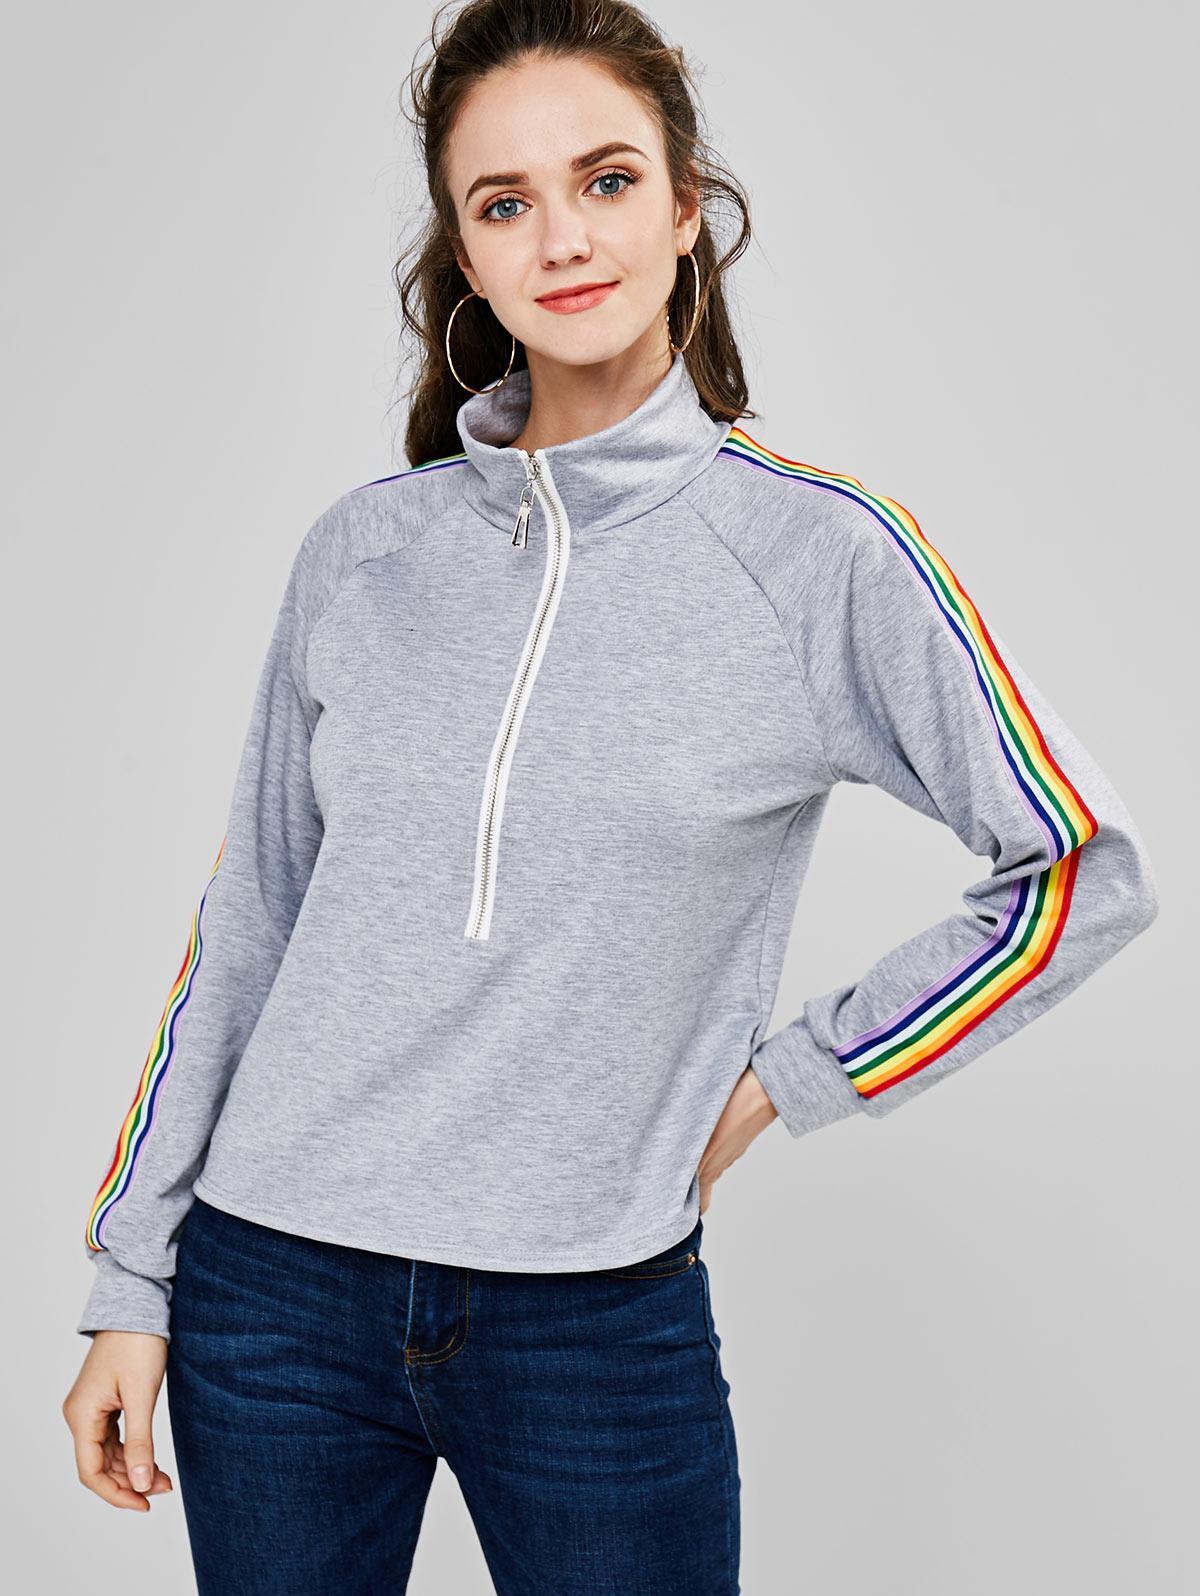 ZAFUL Half Zip Rainbow Striped Sweatshirt